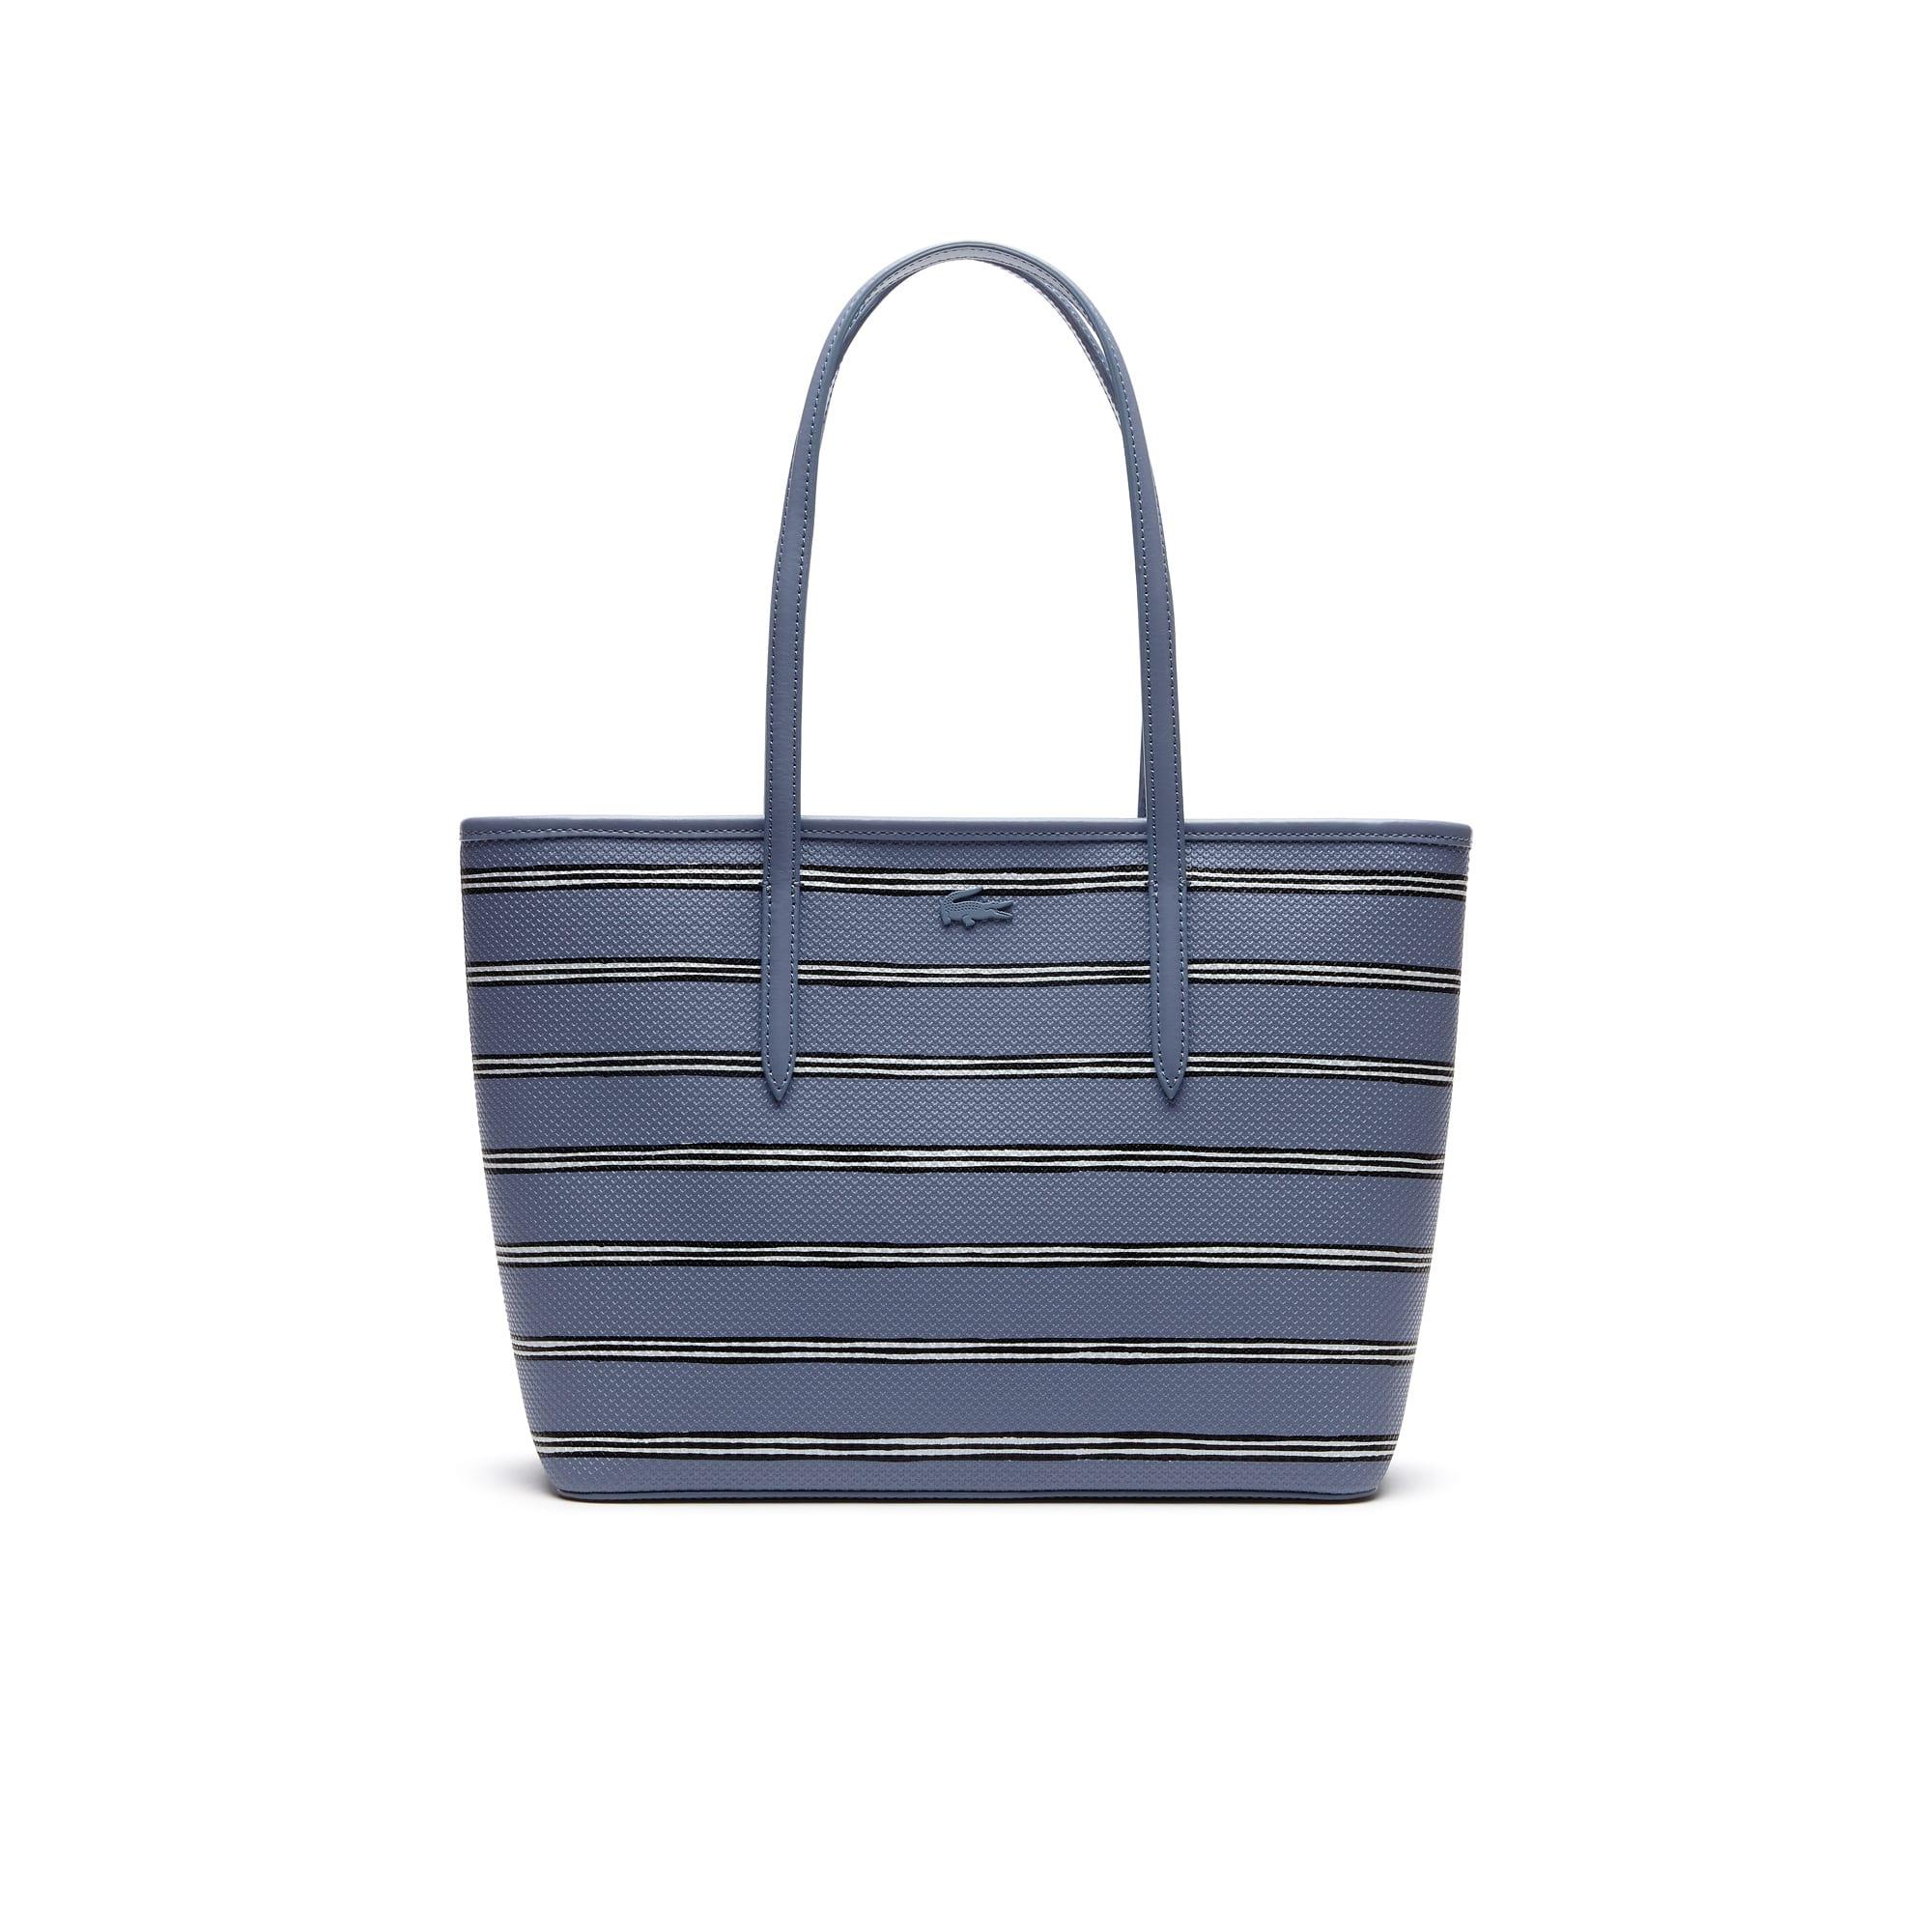 Damen Chantaco Leder Tote Bag aus Piquéleder mit Streifenprint